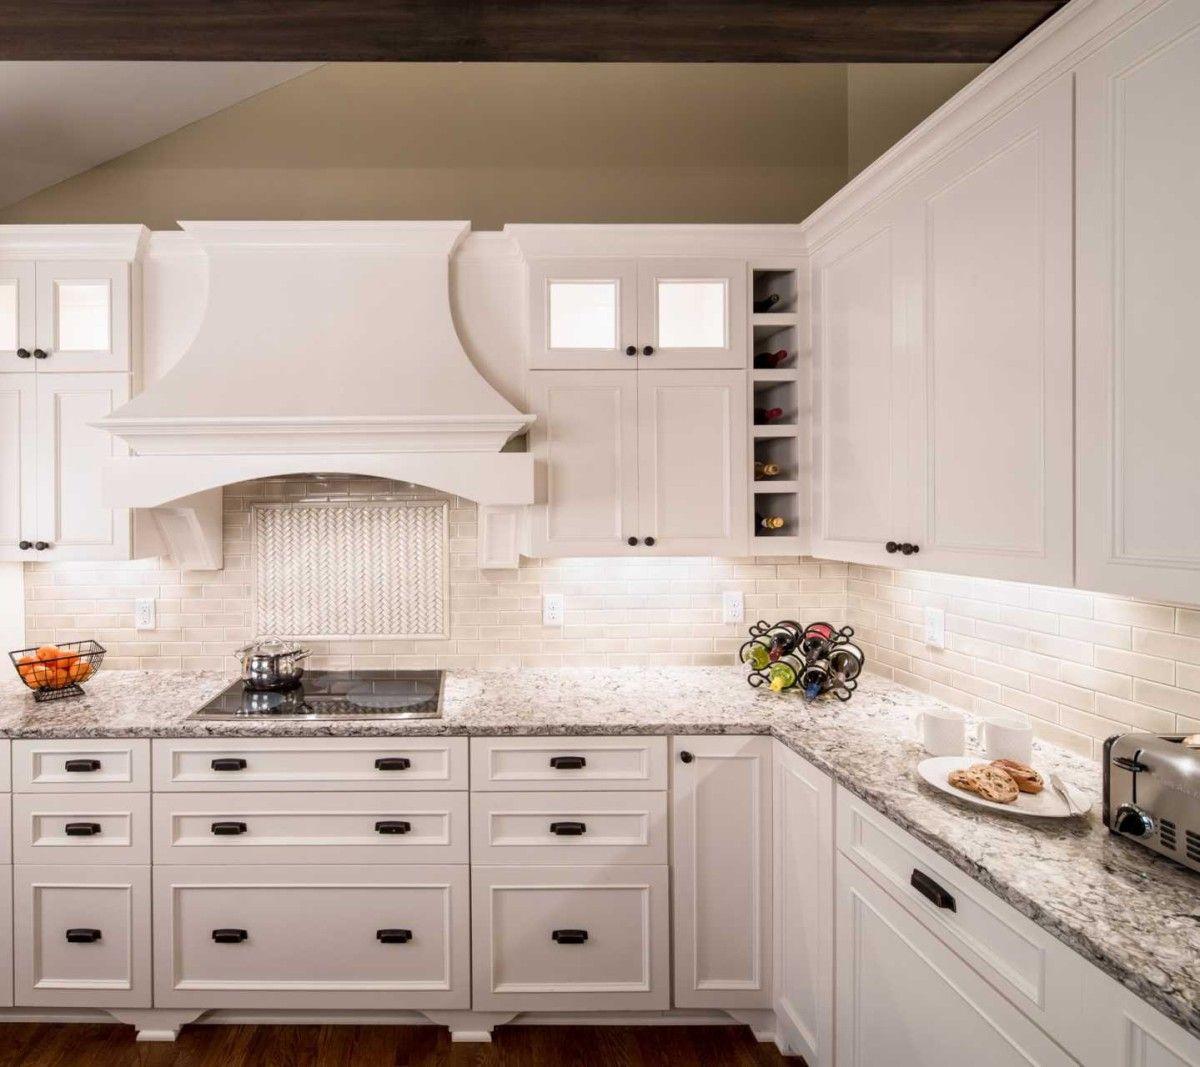 White Kitchen Cabinets Resale Value: Cambria Bellingham White Cabinets Backsplash Ideas